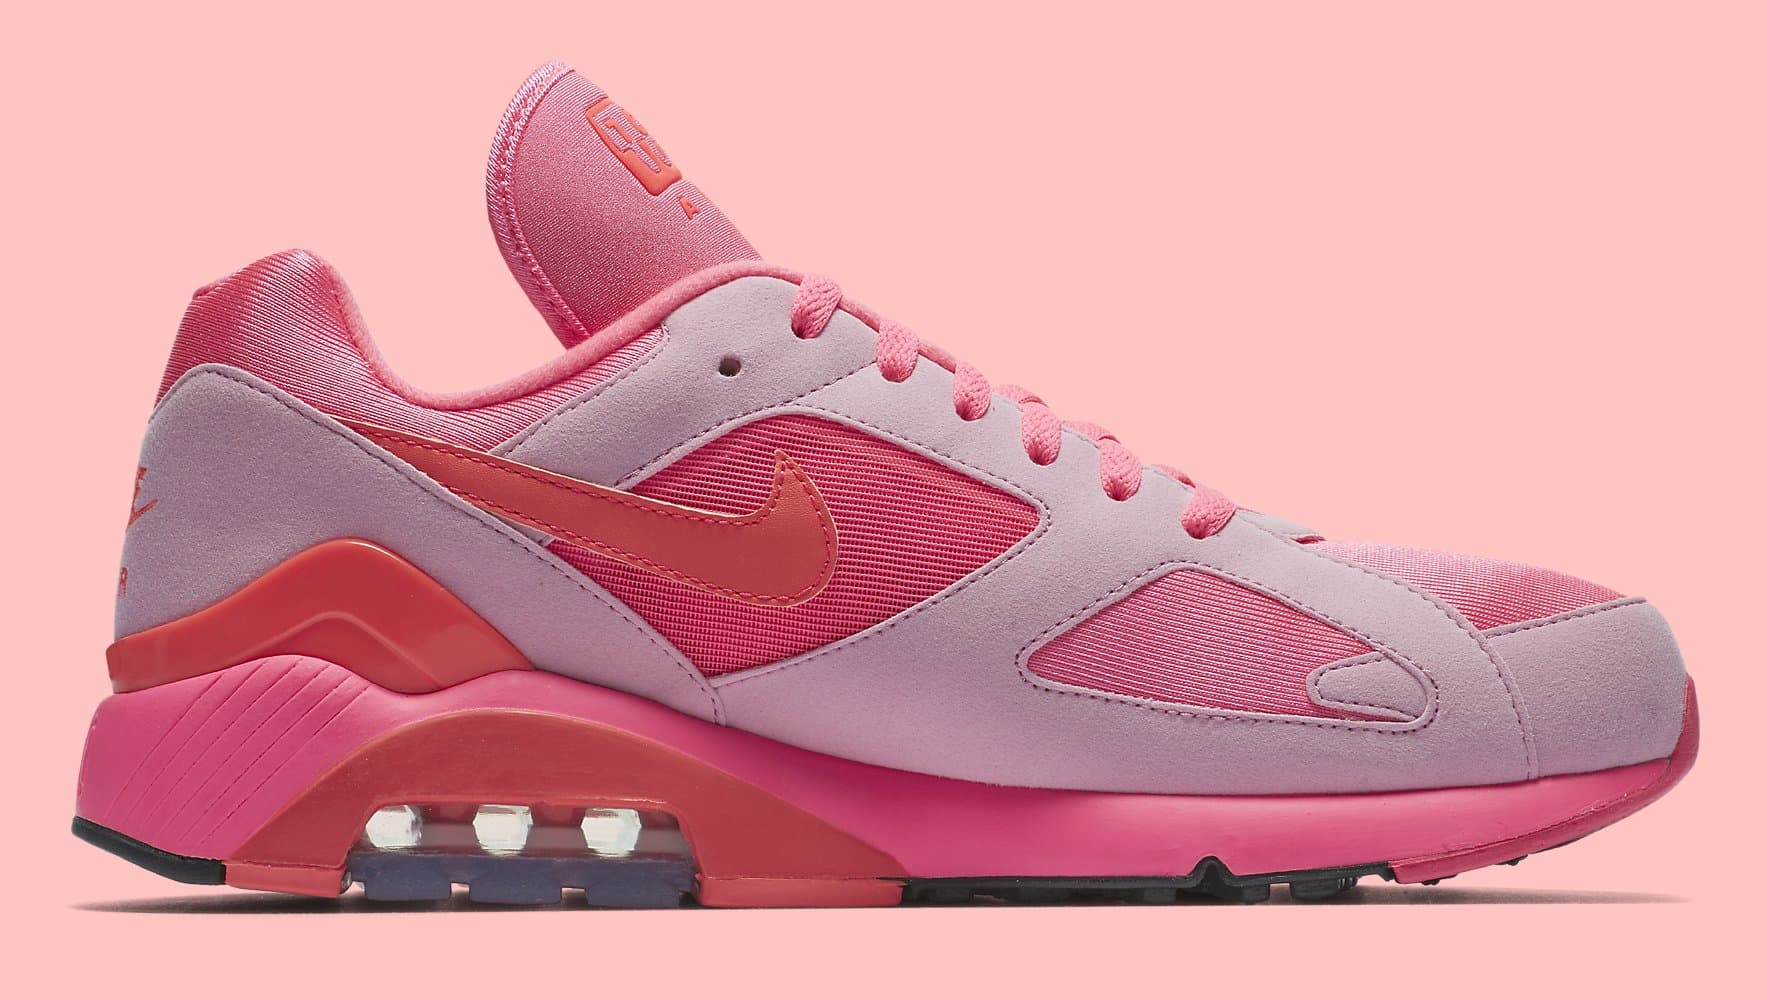 Sepatu Nike Air Max 180 x Comme des Garcons CDG 2018 - Pink Rise